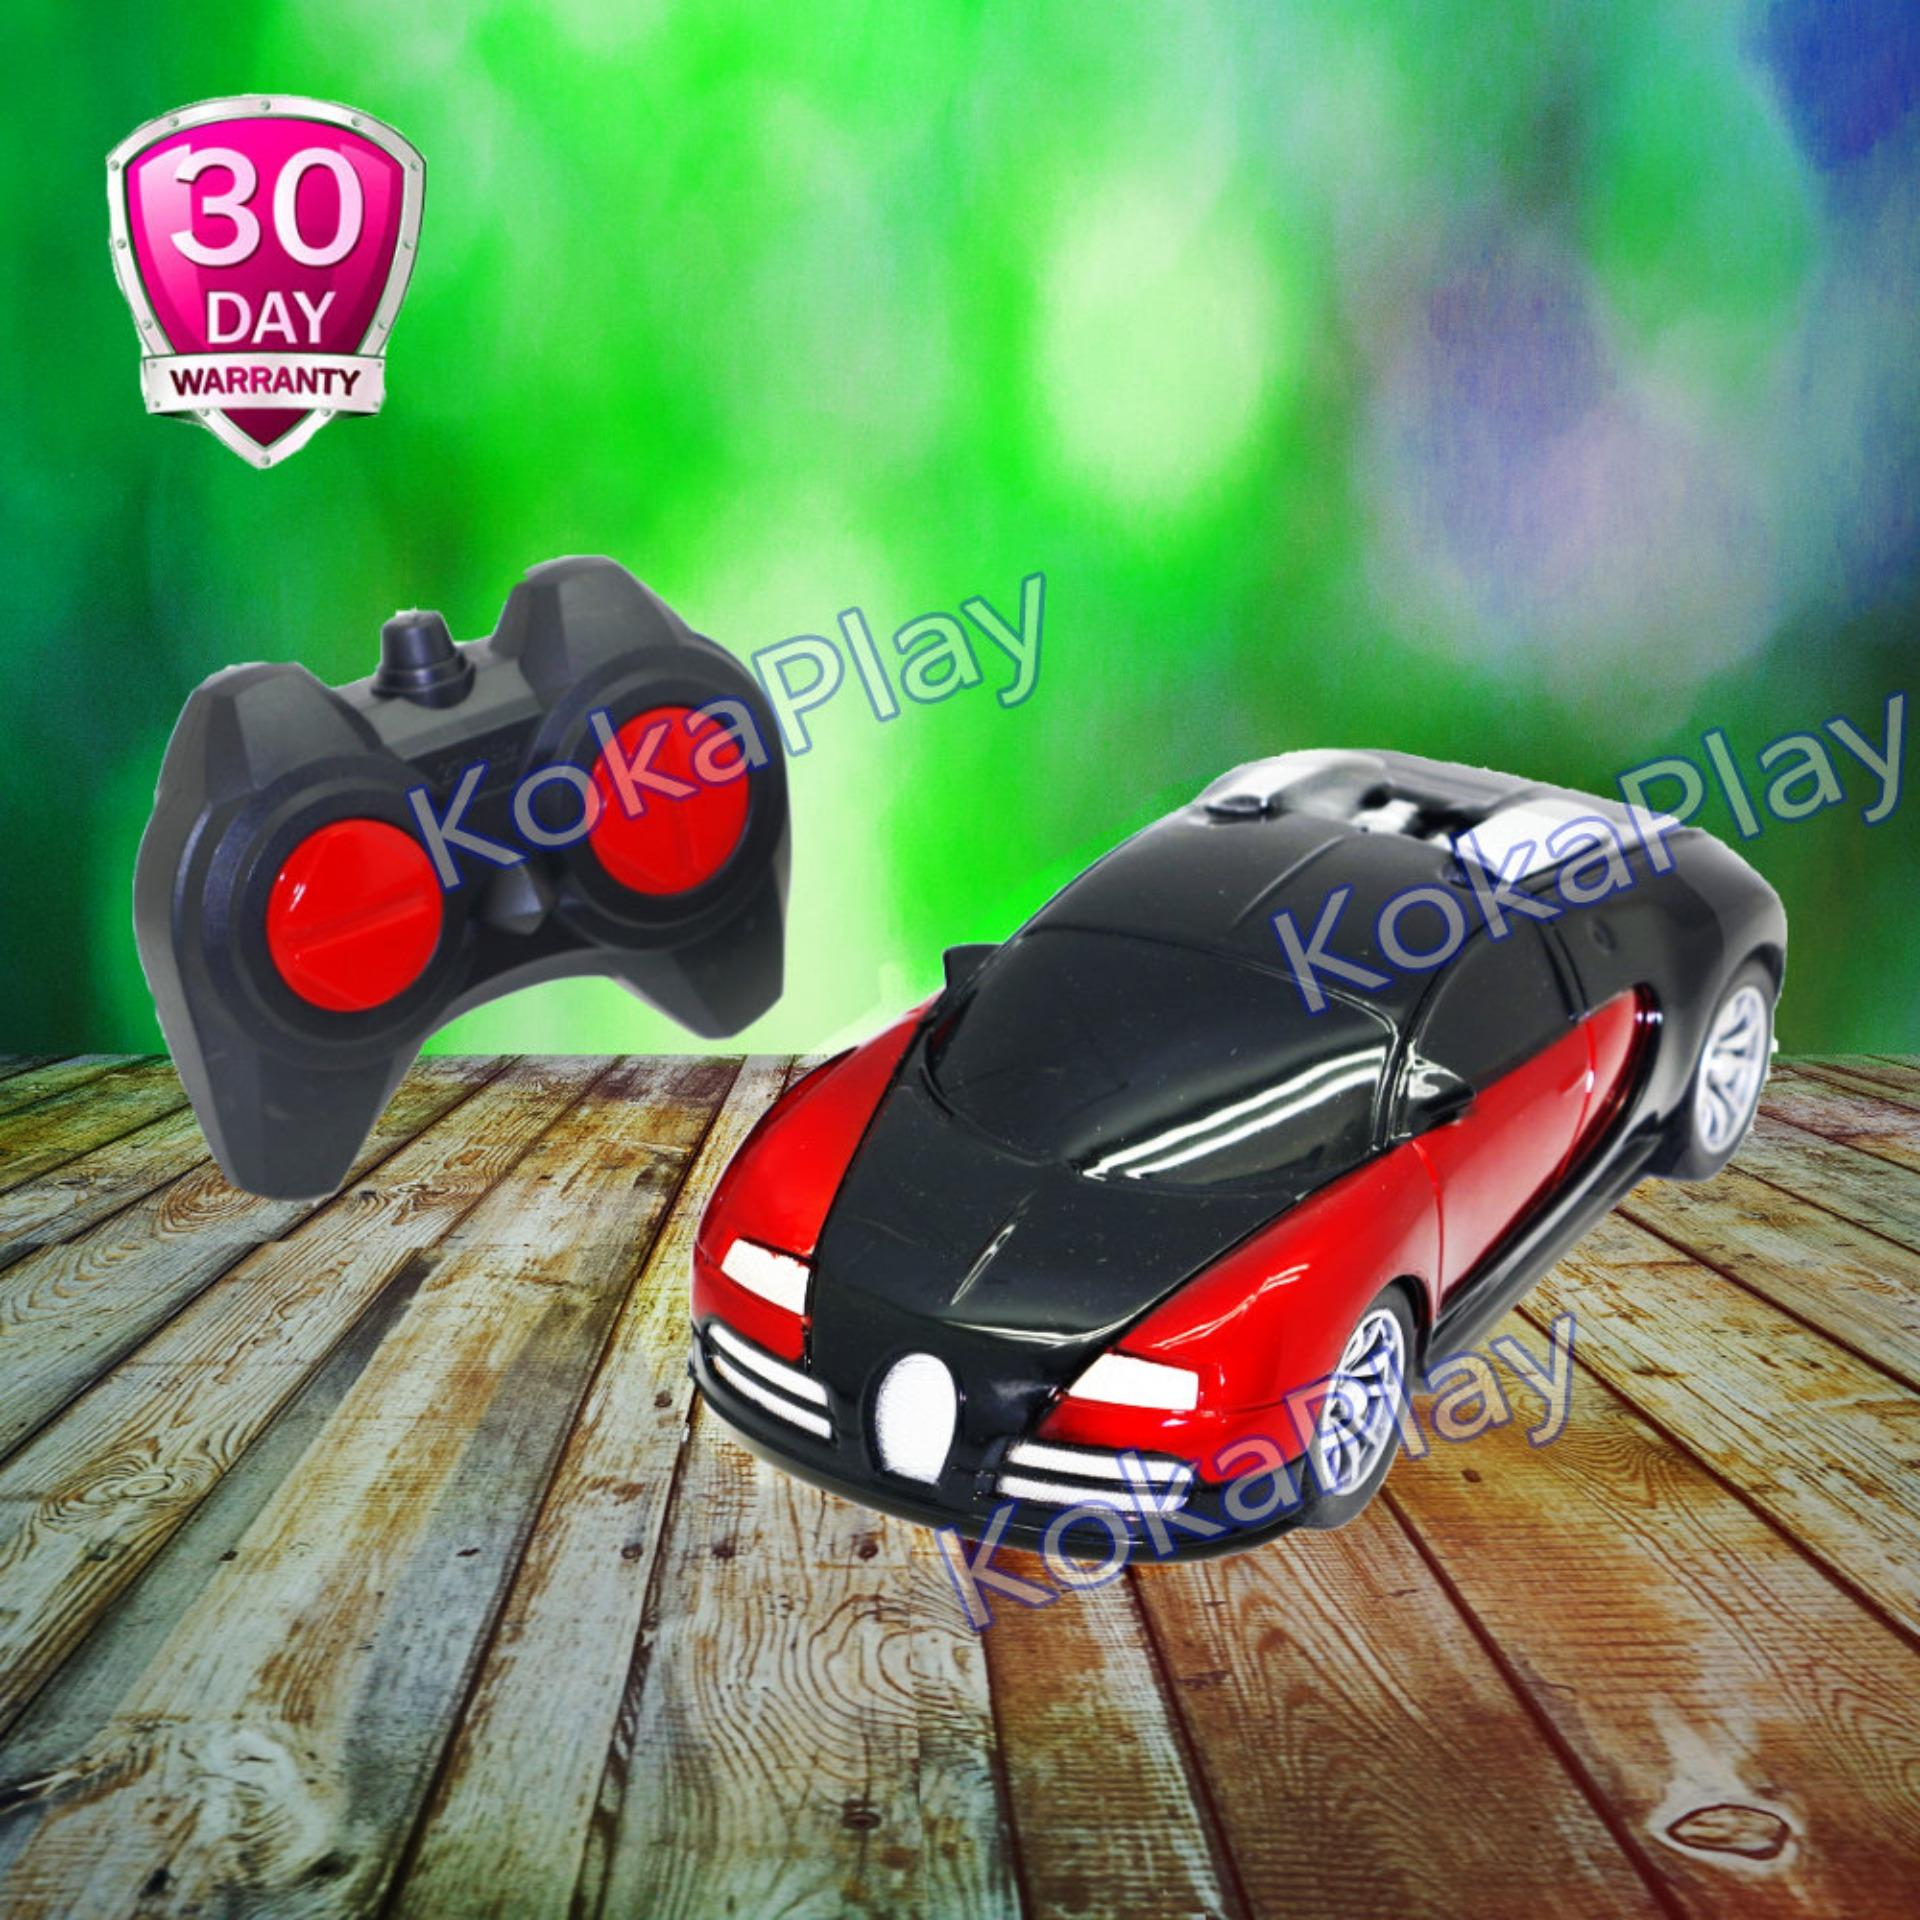 Harga Kokaplay Rc Bugatti Veyron Mainan Mobil Radio Remote Control Luxury Sports Car Asli Kokaplay